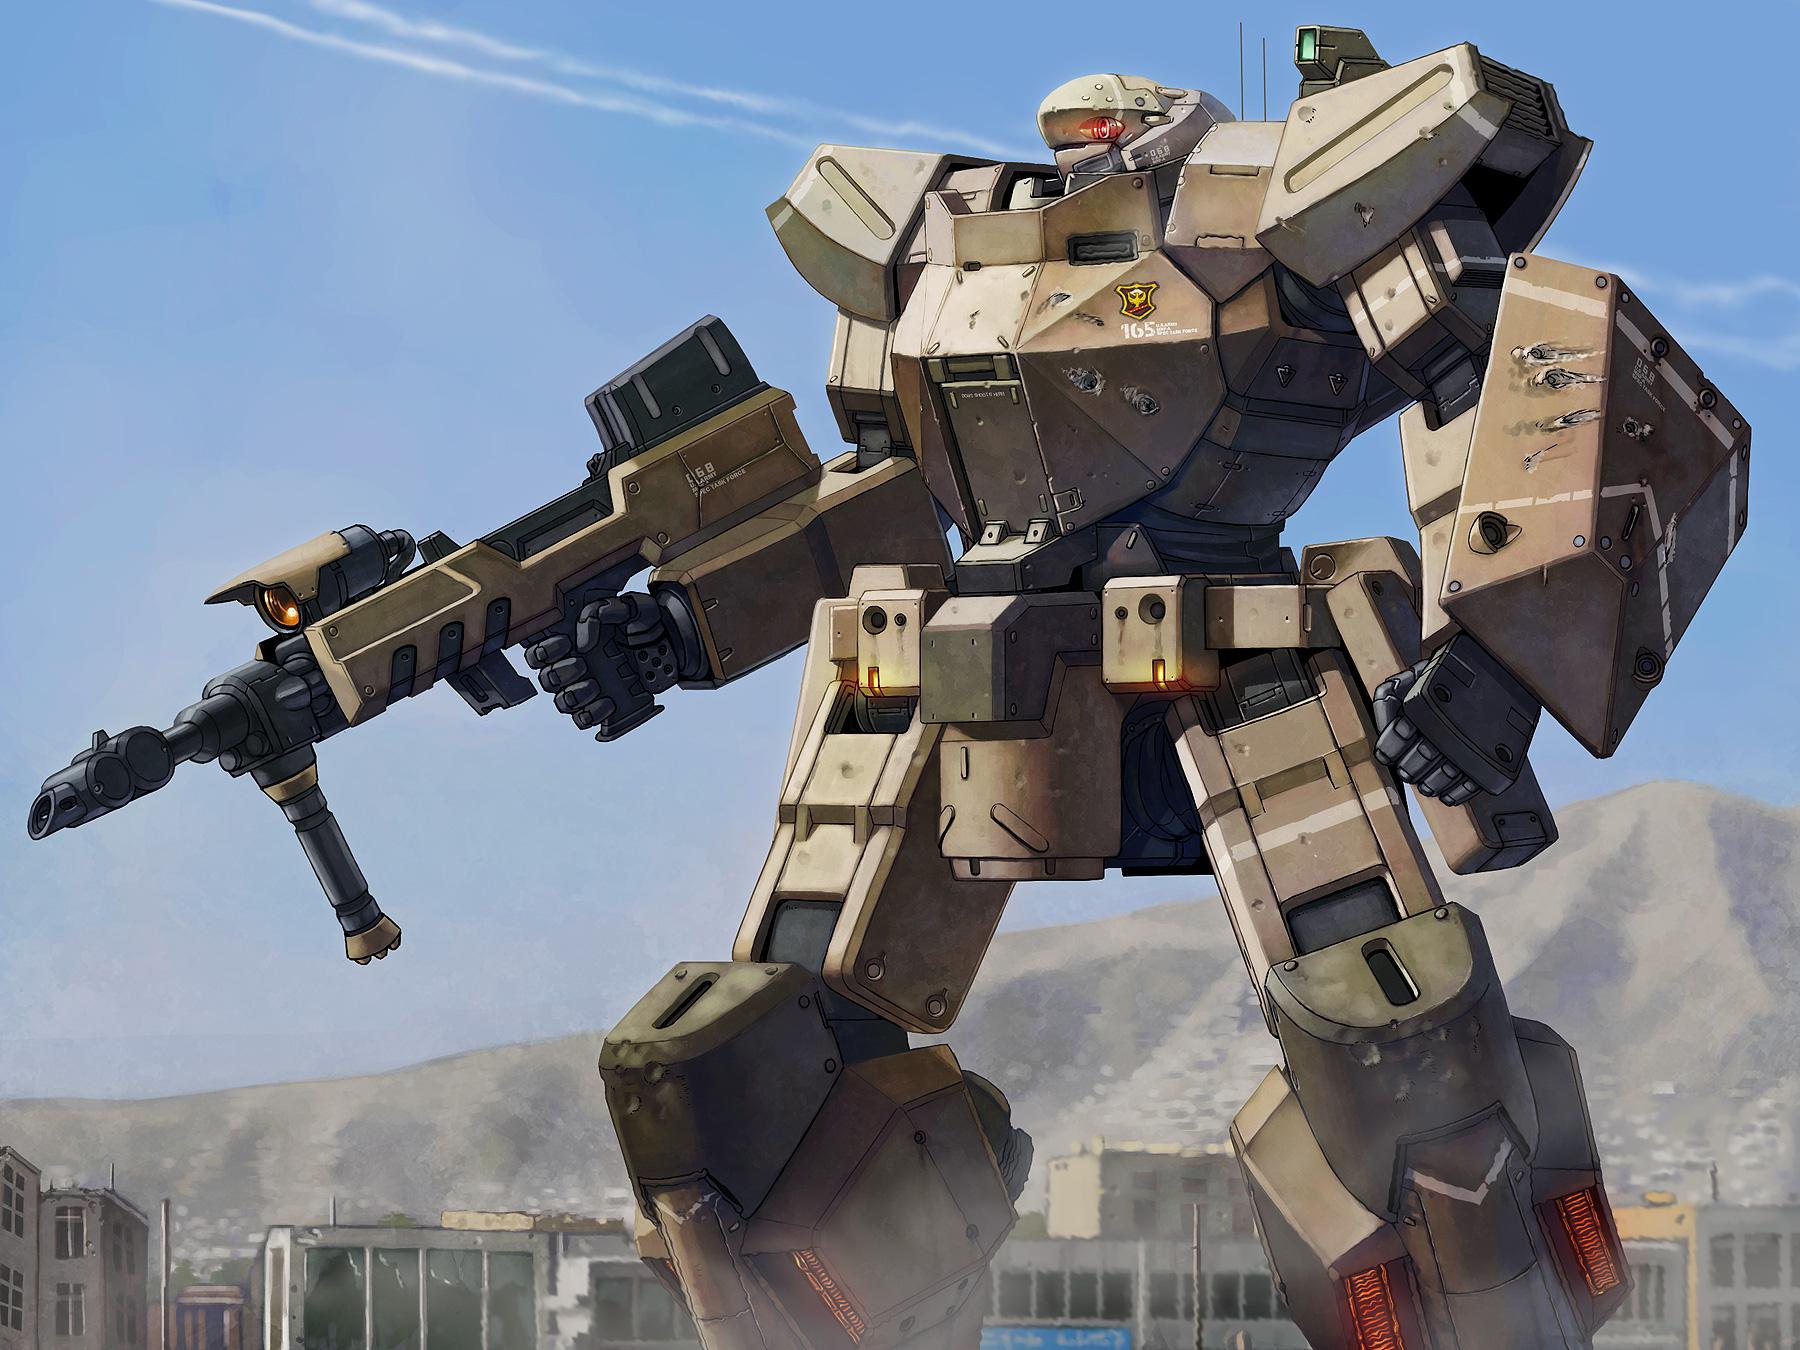 Картинки про роботов из аниме